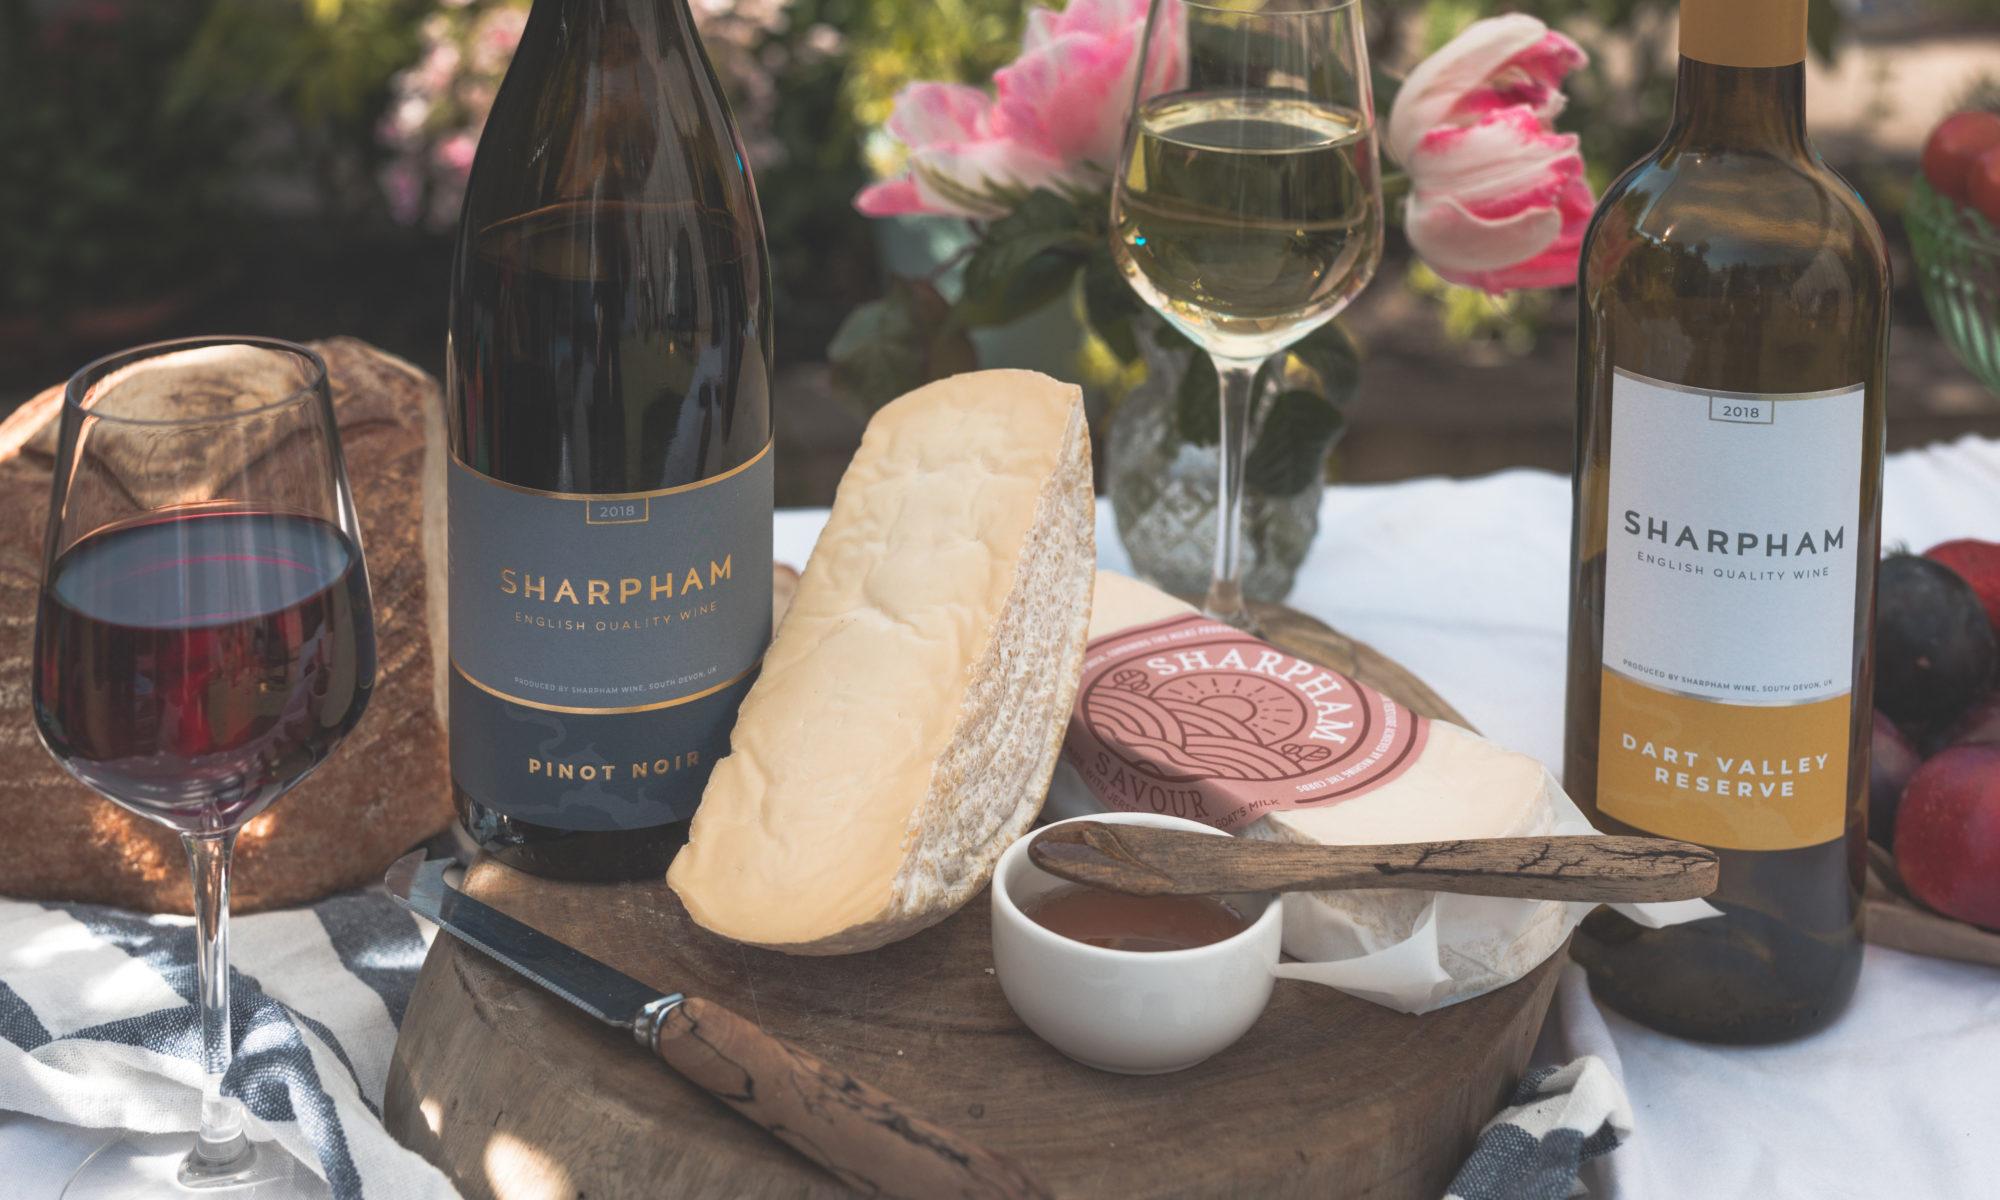 sharpham cheese and wine in sunshine food press